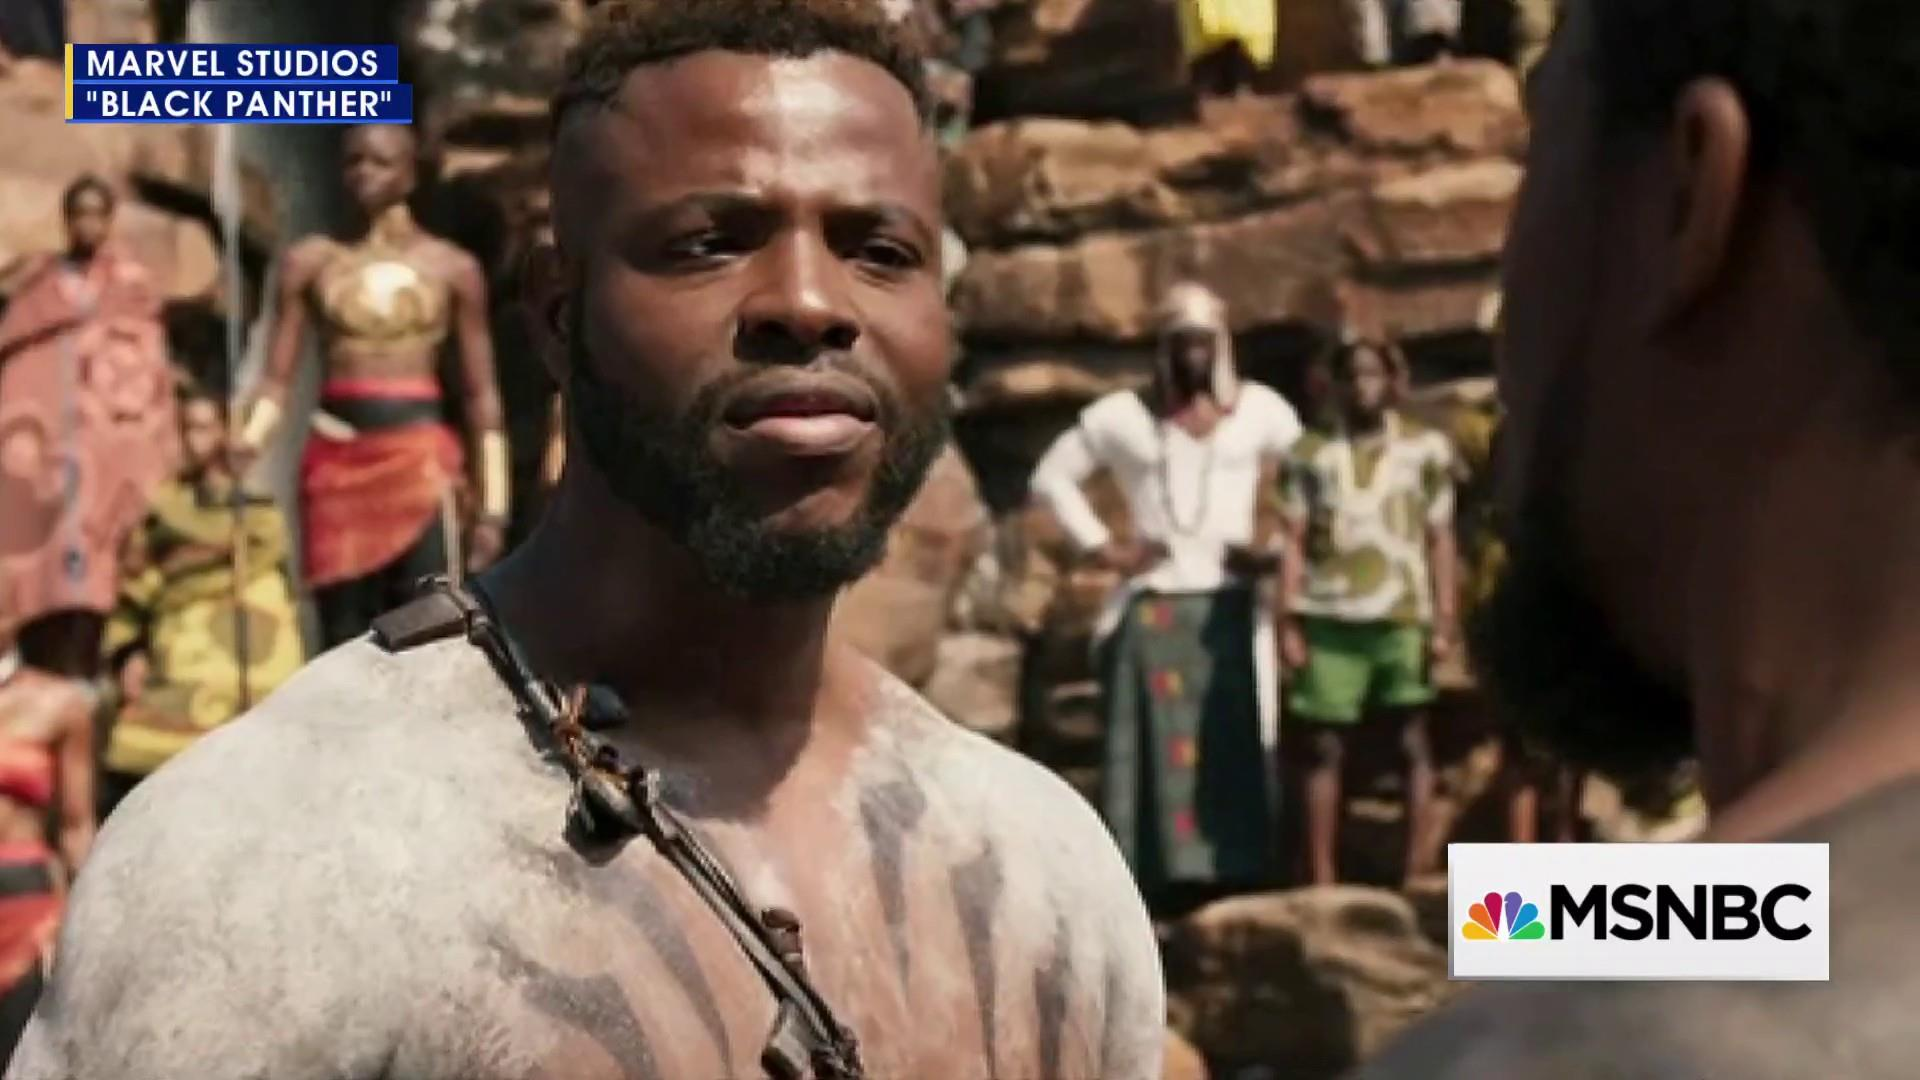 Meet 'Black Panther' breakout star Winston Duke